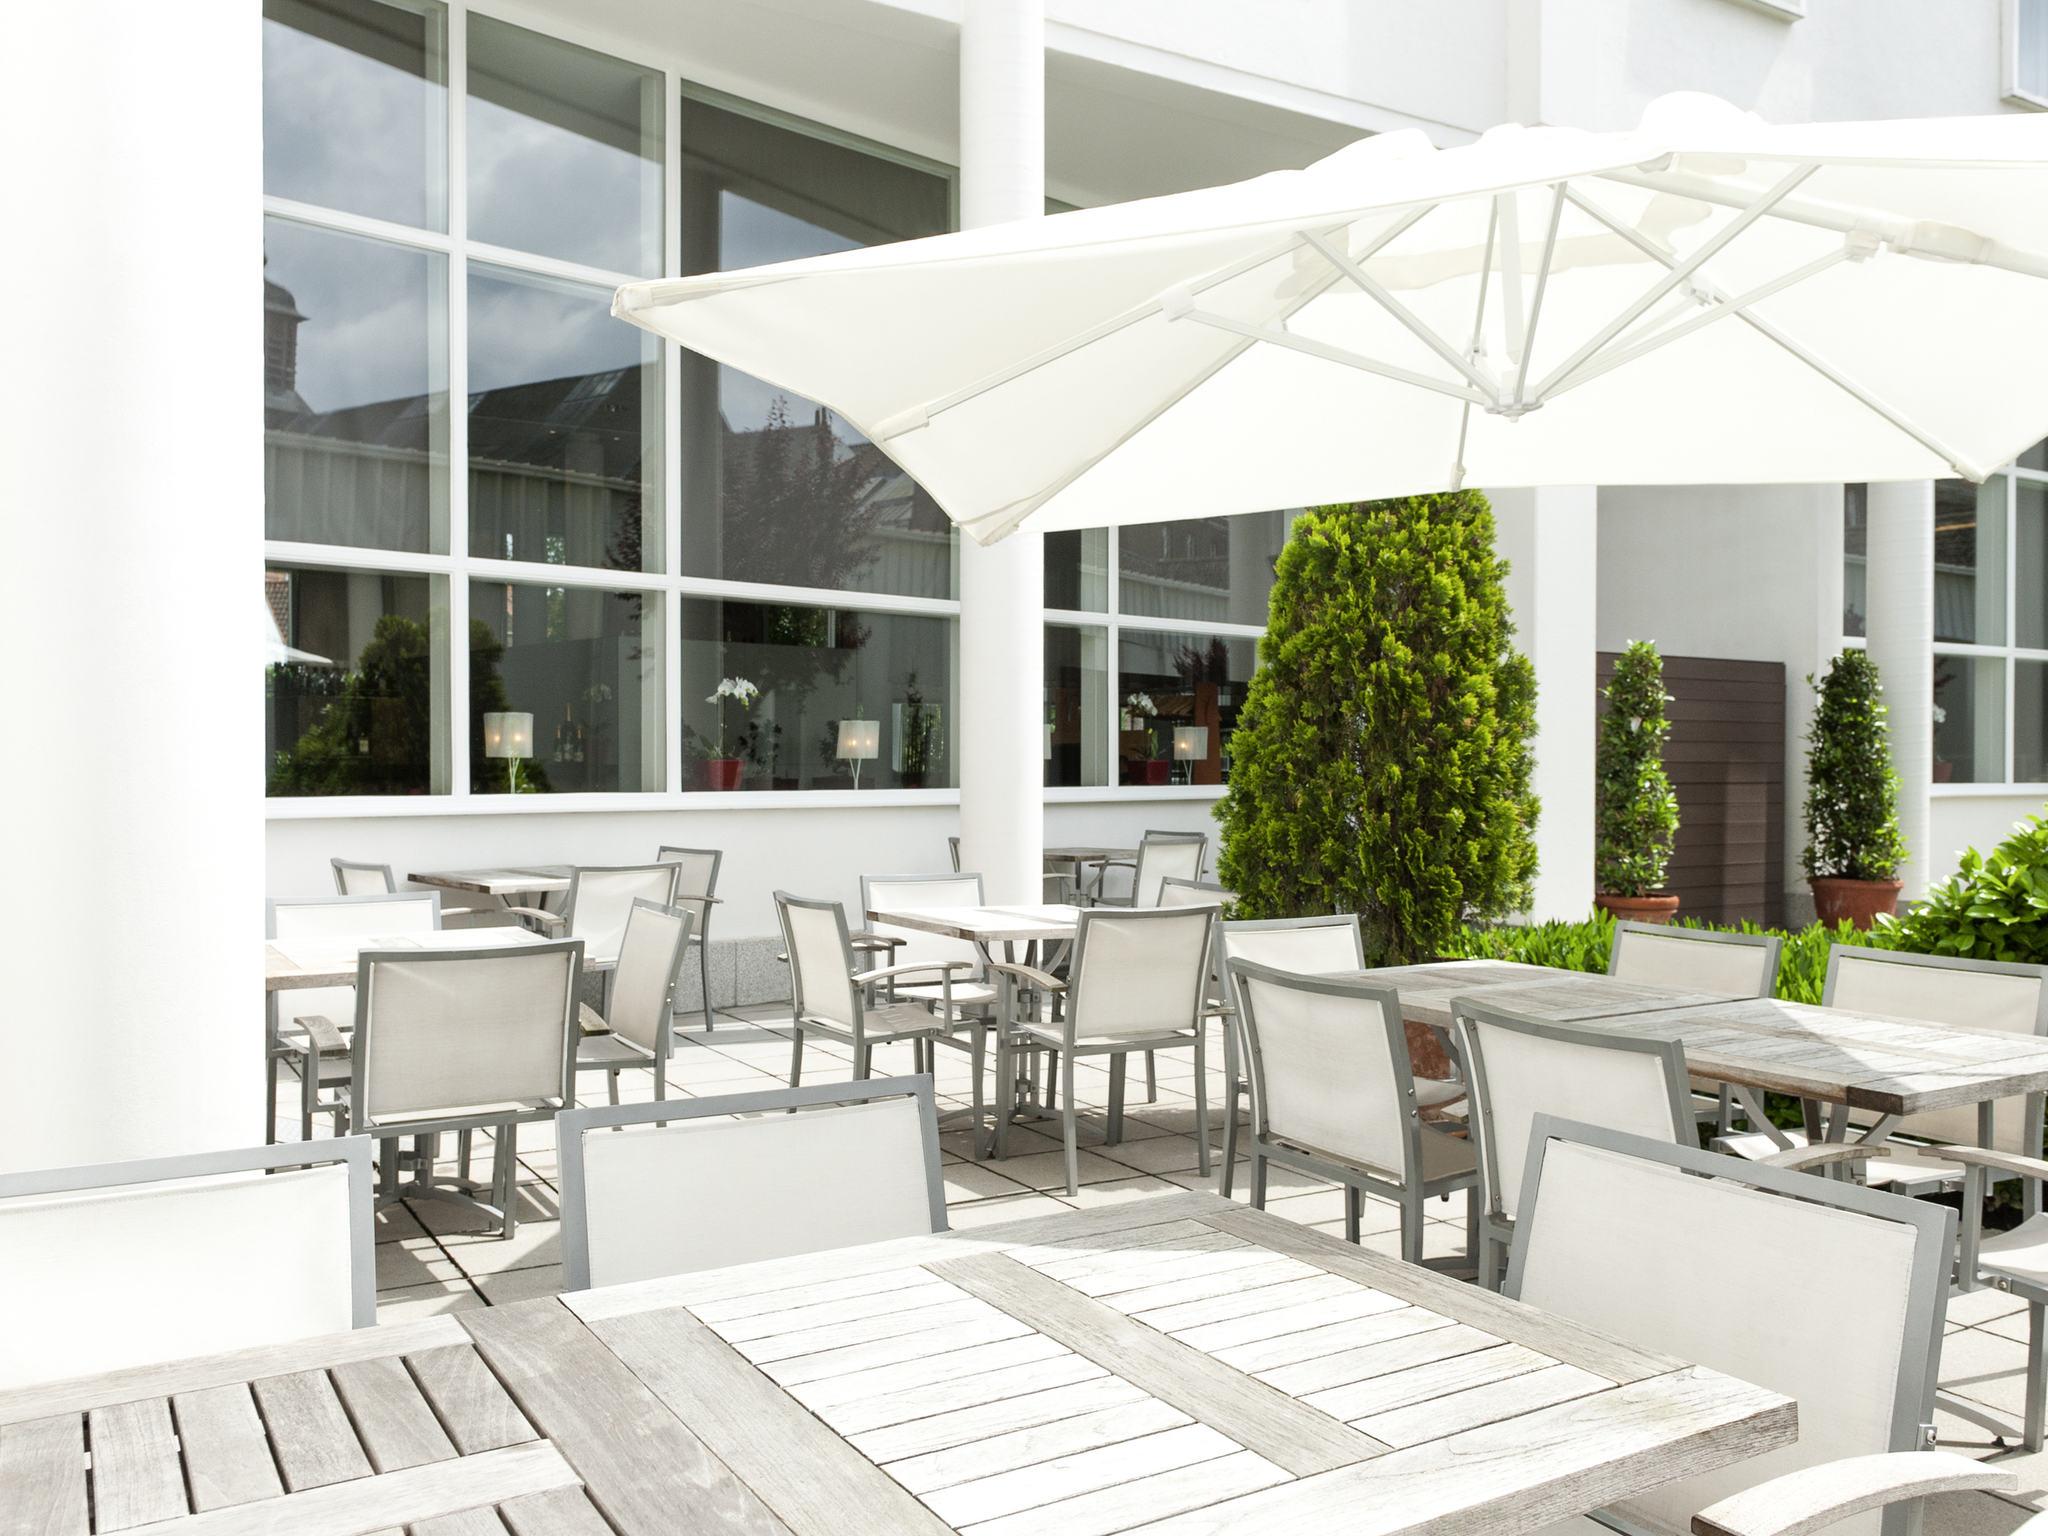 Hotel Novotel Brugge Centrum